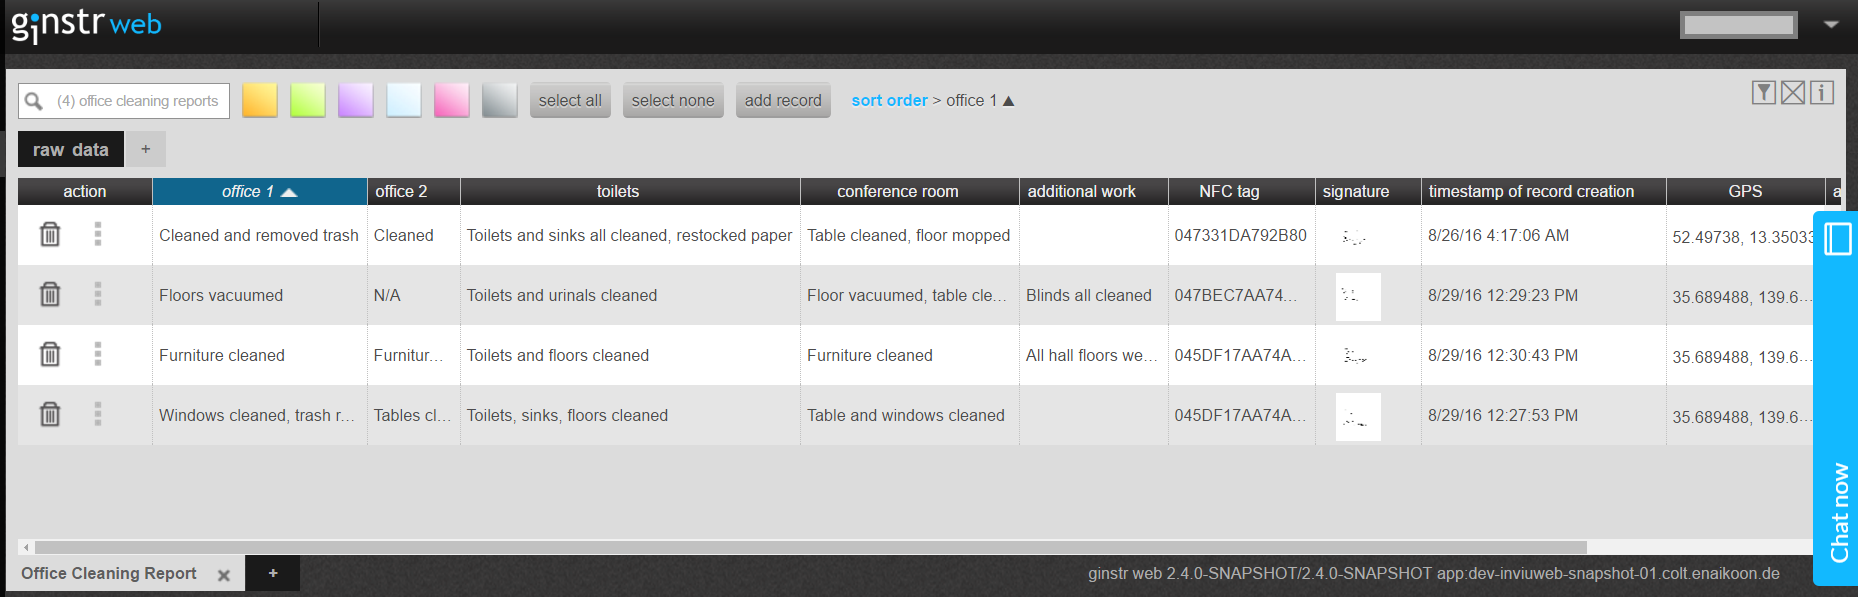 ginstr_app_officeCleaningReport_EN-6